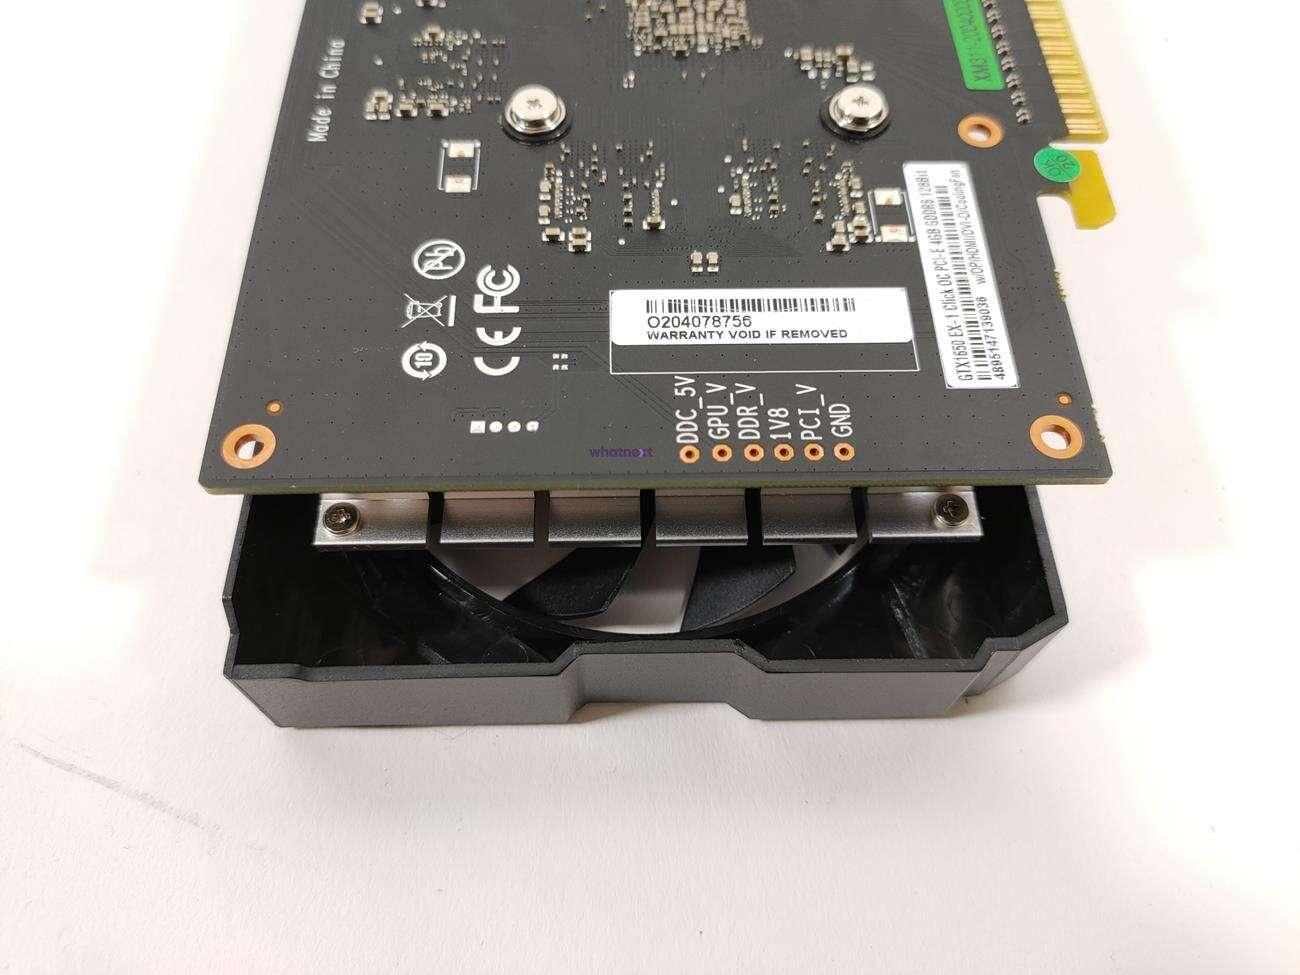 test KFA2 GeForce GTX 1650 SUPER EX (1-Click OC) GDDR6, recenzja KFA2 GeForce GTX 1650 SUPER EX (1-Click OC) GDDR6 review KFA2 GeForce GTX 1650 SUPER EX (1-Click OC) GDDR6, opinia KFA2 GeForce GTX 1650 SUPER EX (1-Click OC) GDDR6, cena KFA2 GeForce GTX 1650 SUPER EX (1-Click OC) GDDR6